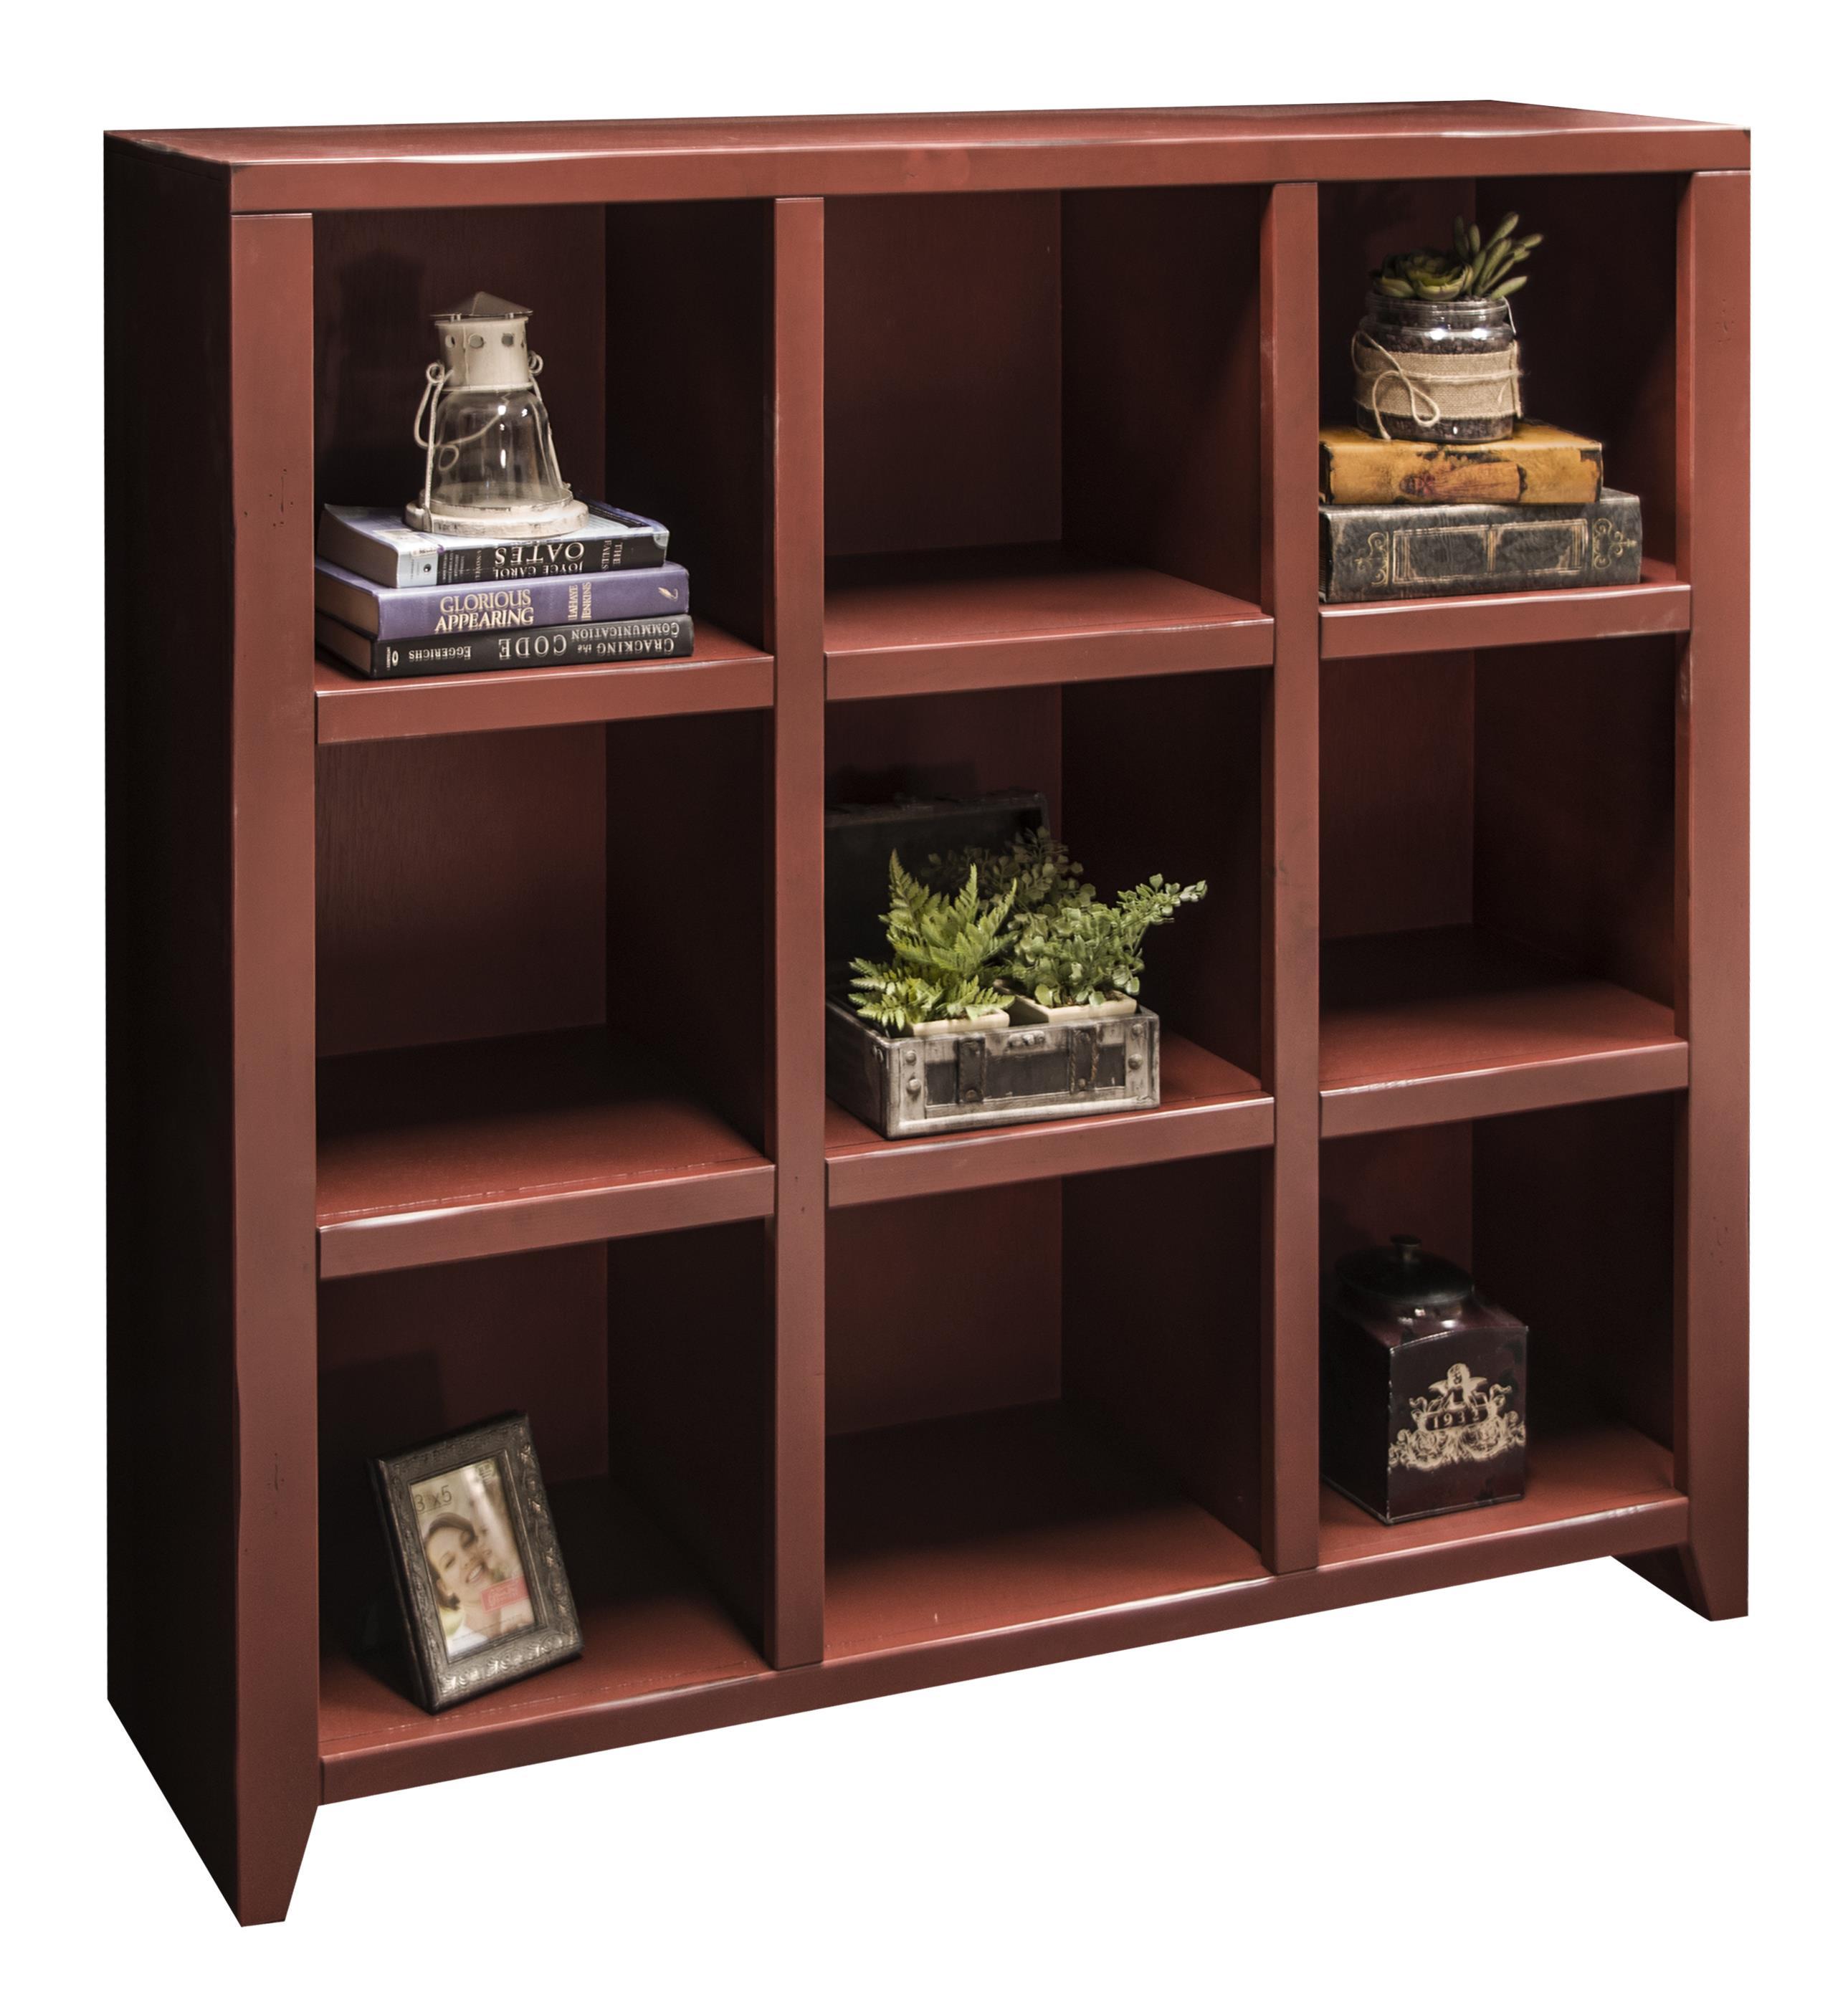 Legends Furniture Calistoga Collection Calistoga 9-Cubicle Bookcase - Item Number: CA6303-RRD